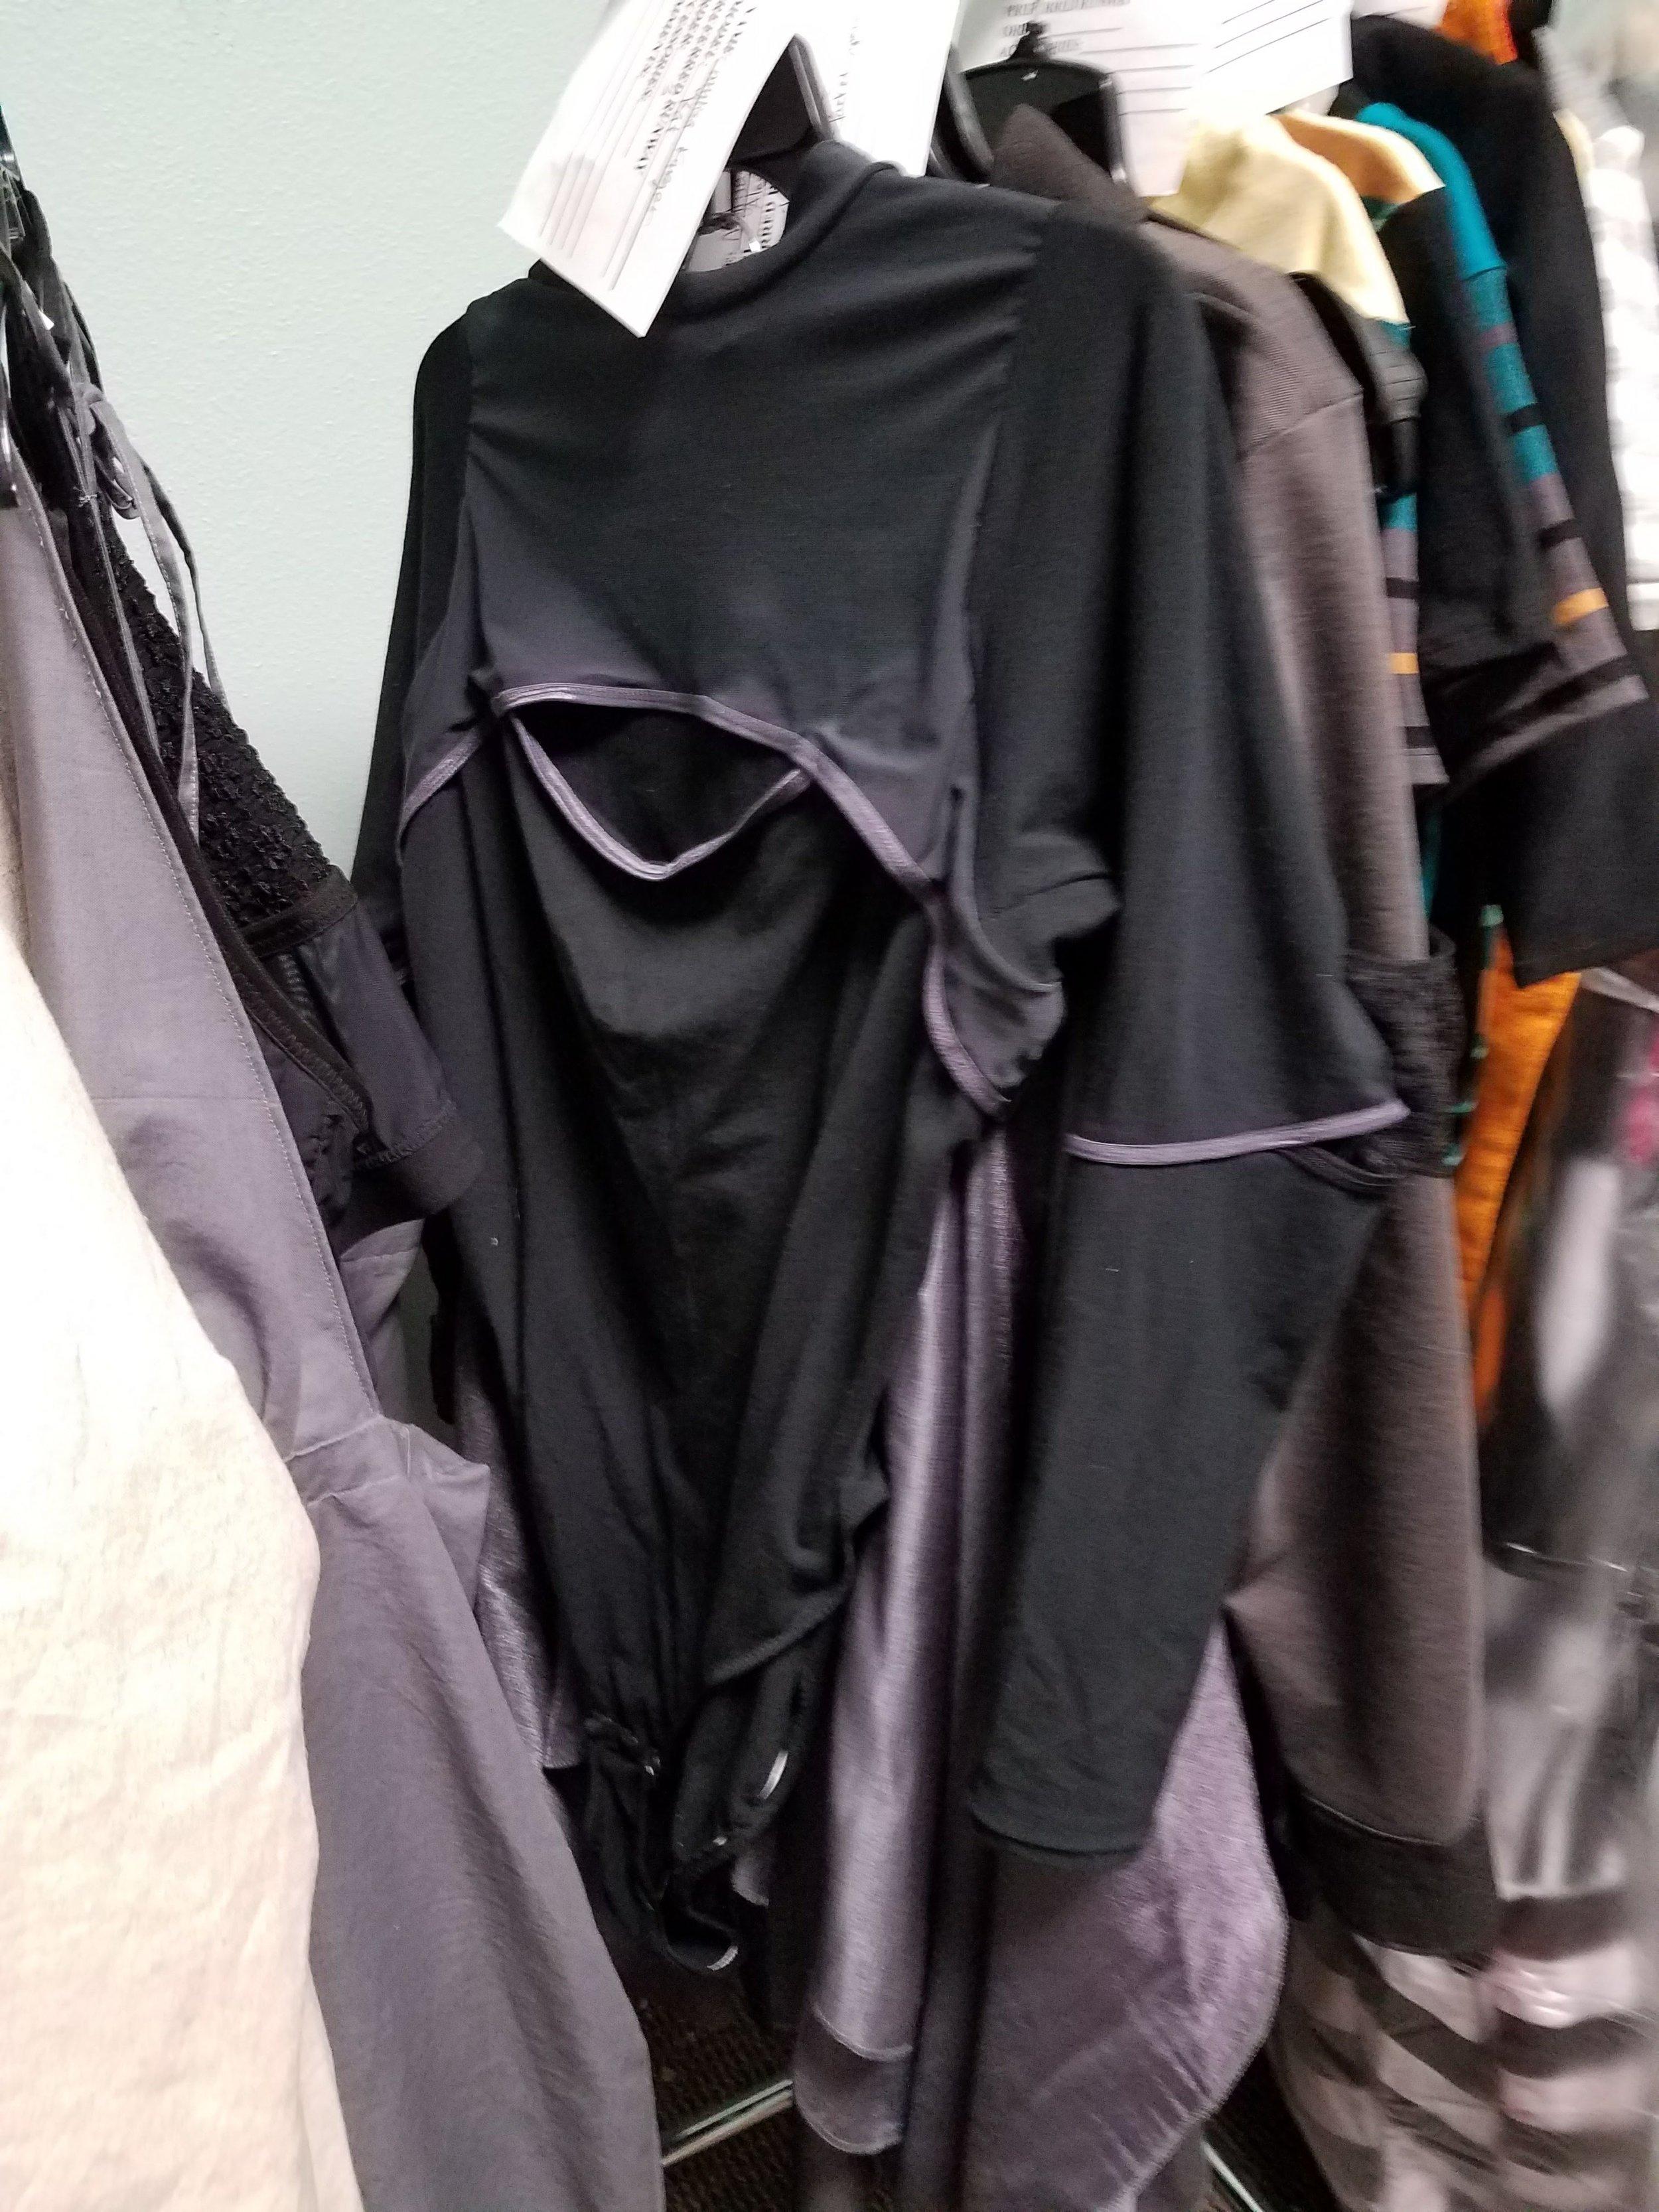 Final Garment Turn-in